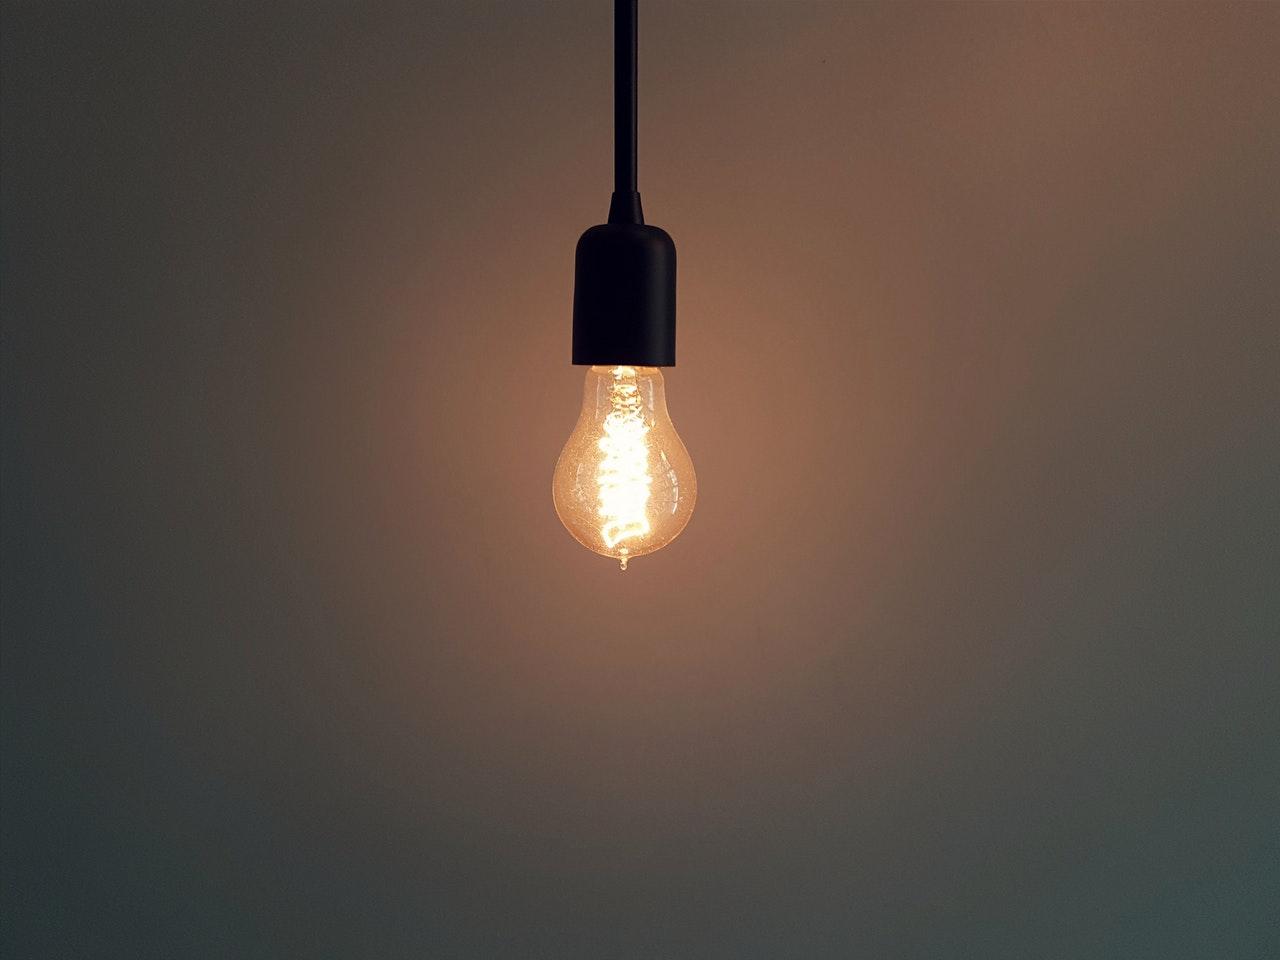 How Brainstorming Improves Creative Problem Solving - Brand